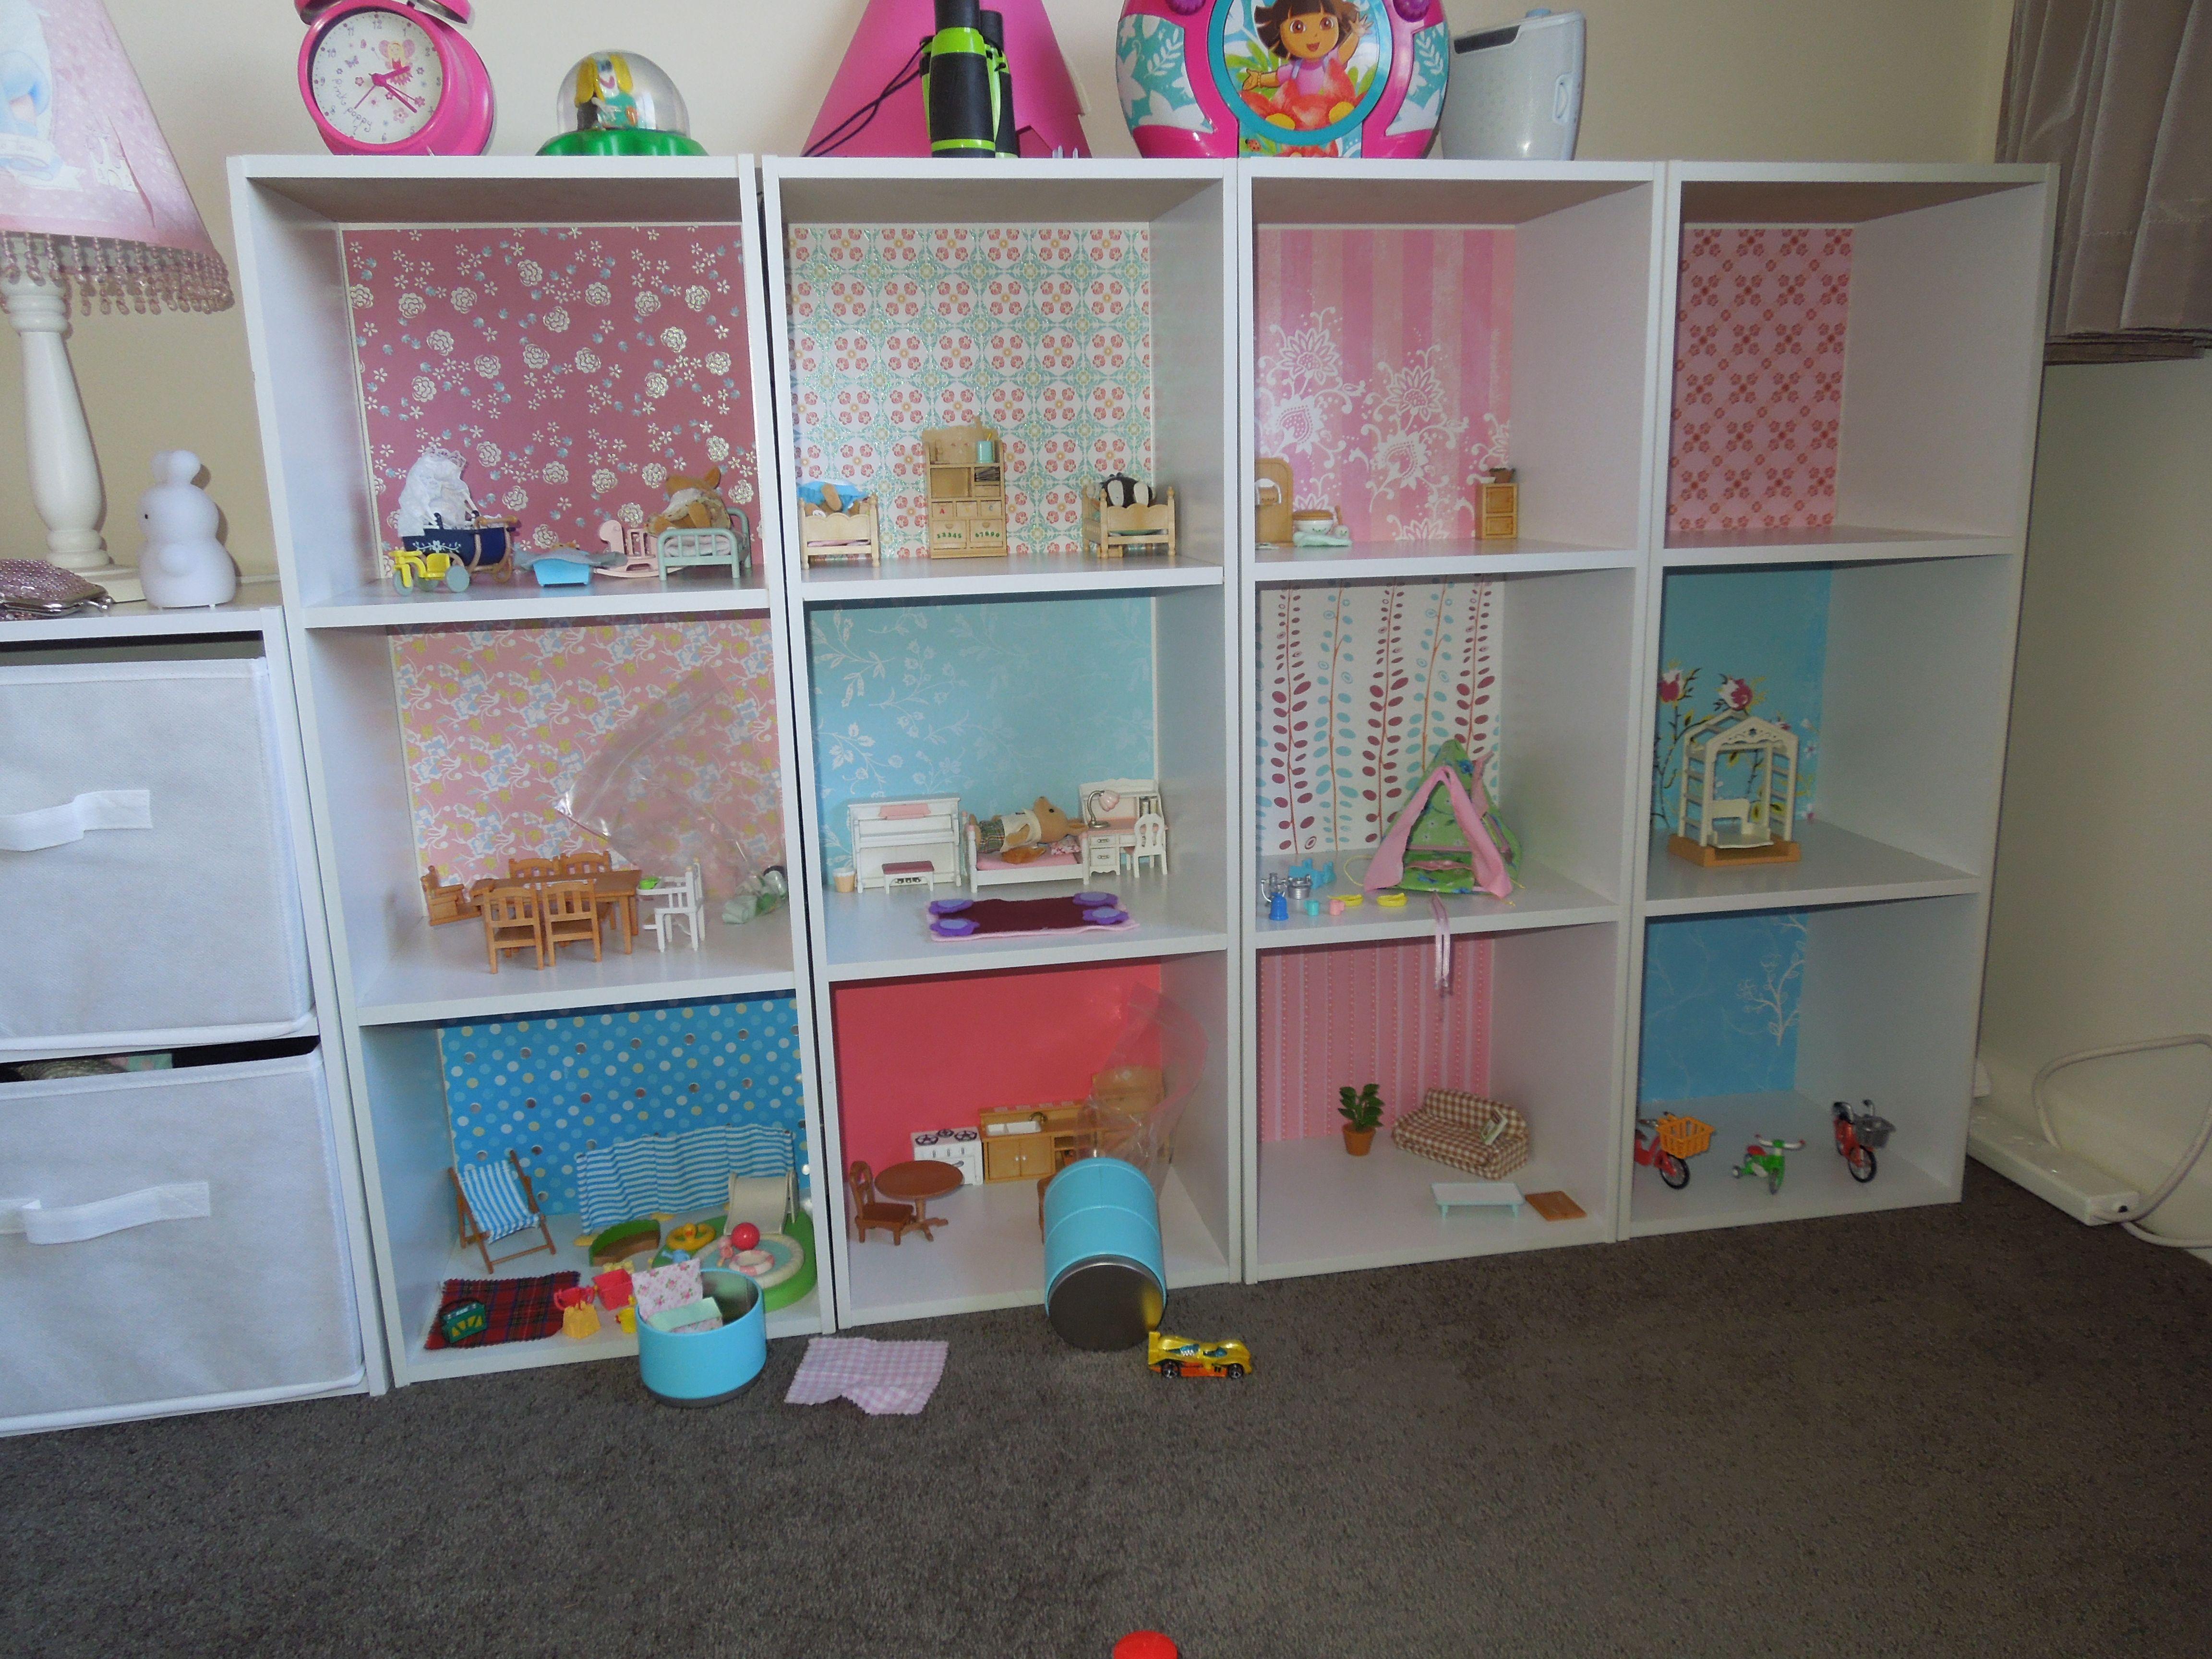 Sylvanian Families House - Cheap Bookshelves With